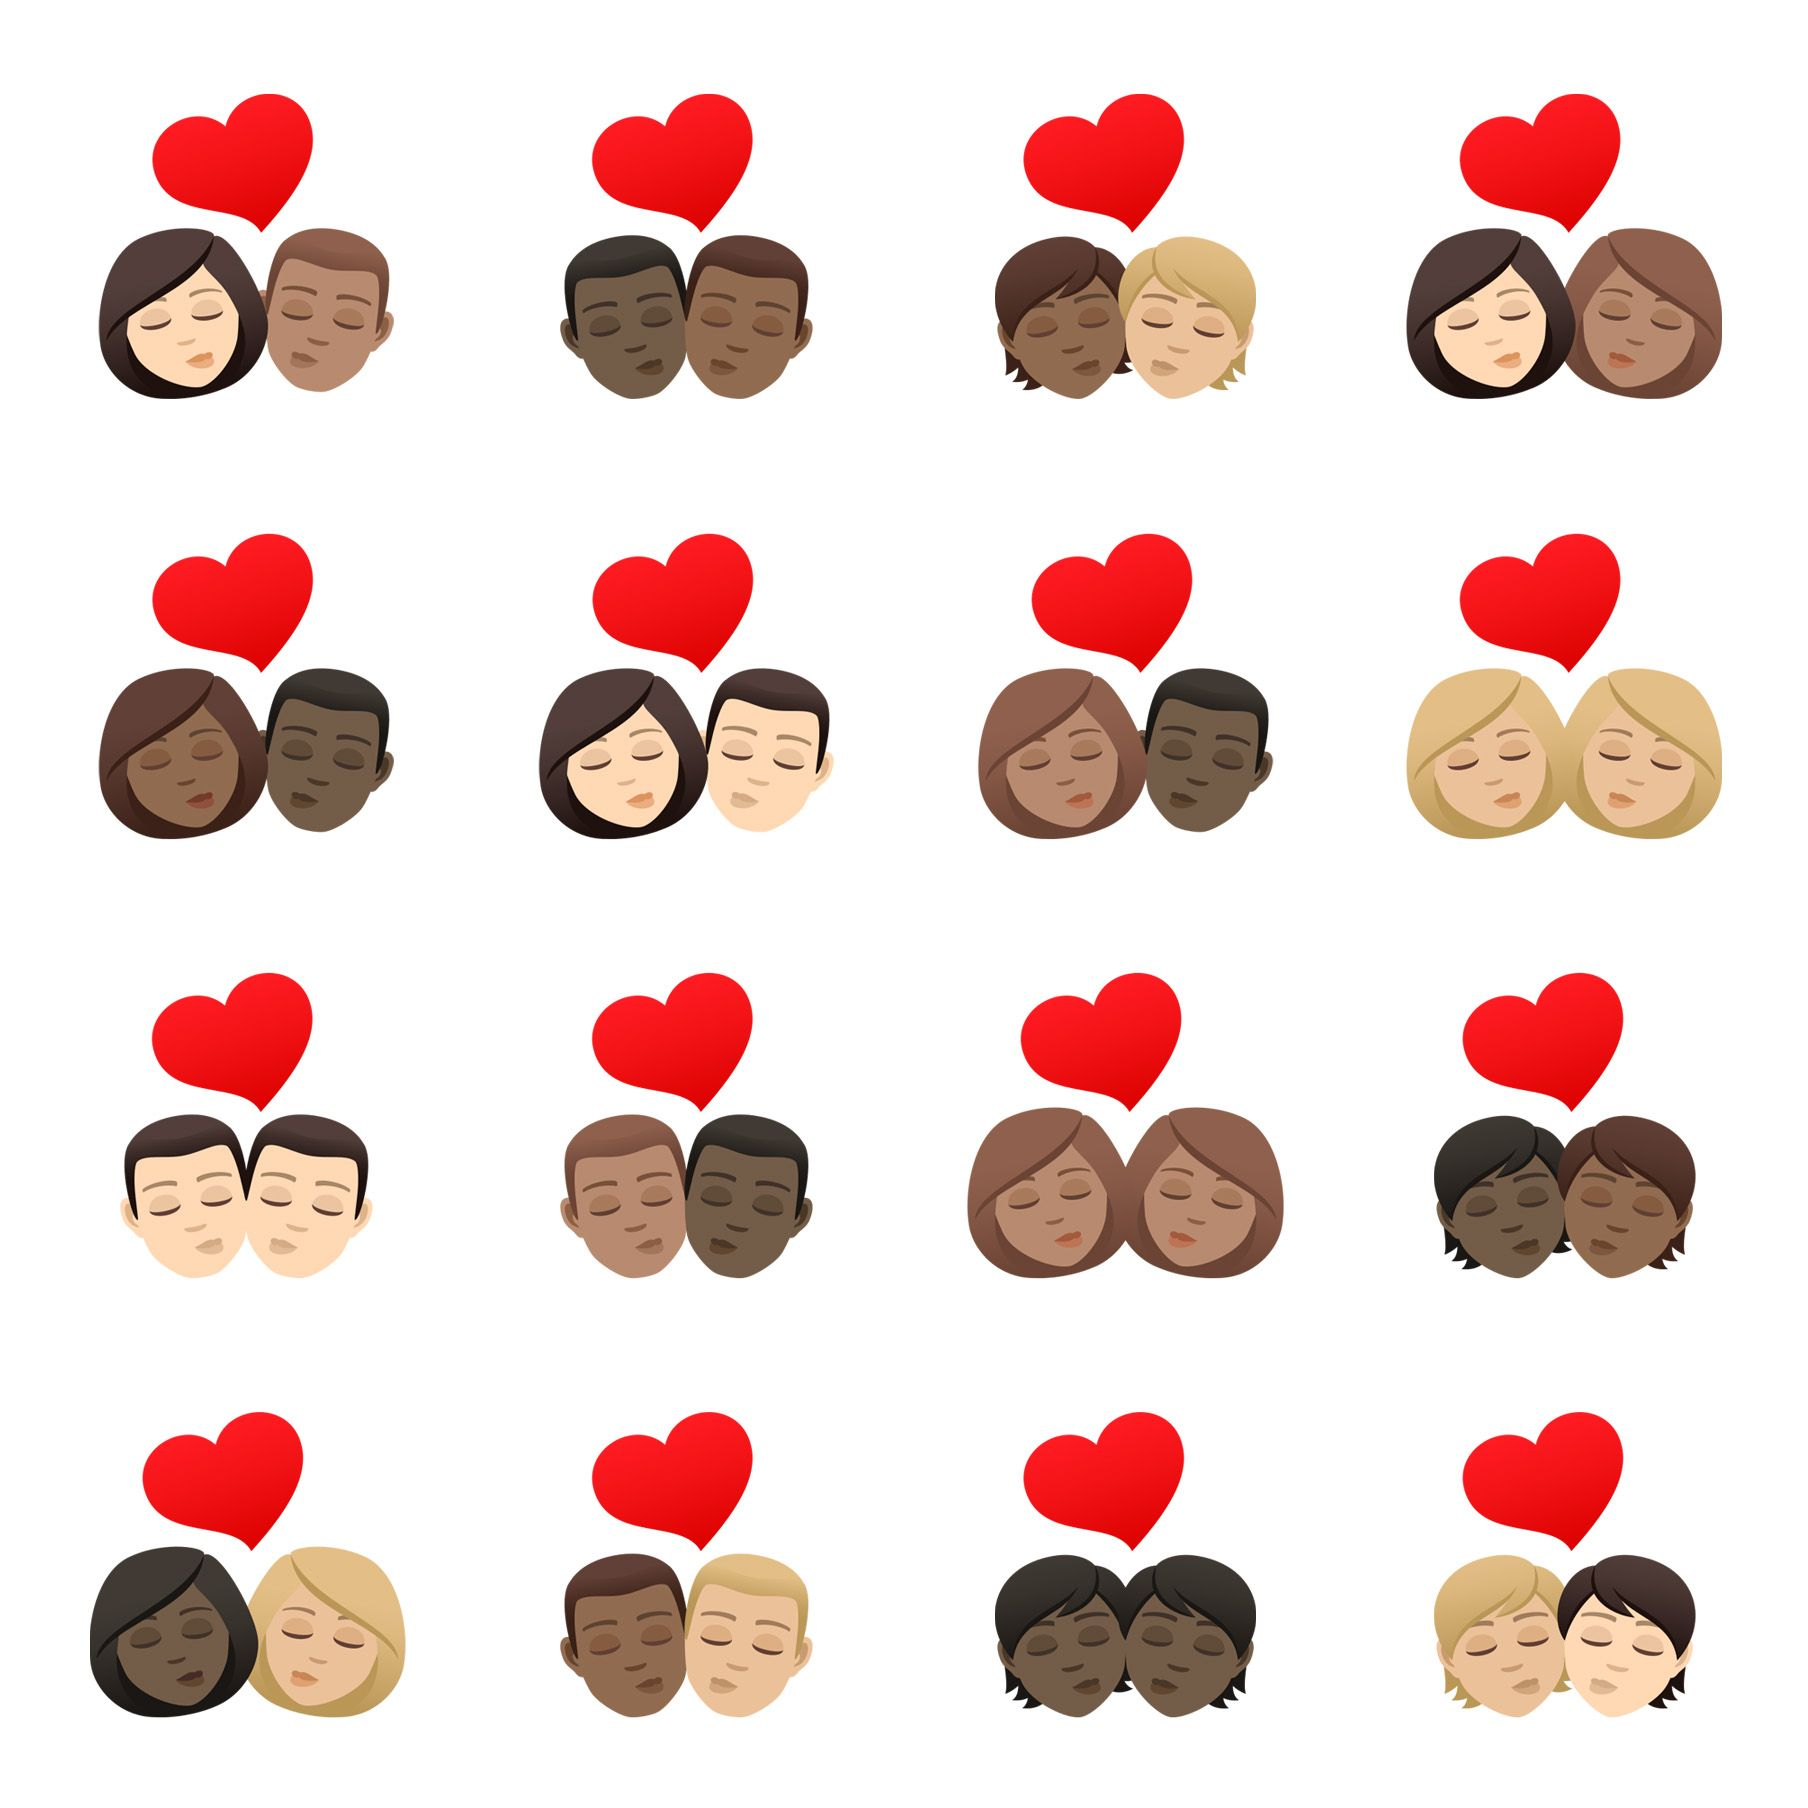 Emojipedia-JoyPixels-6_5-Kiss-Selection